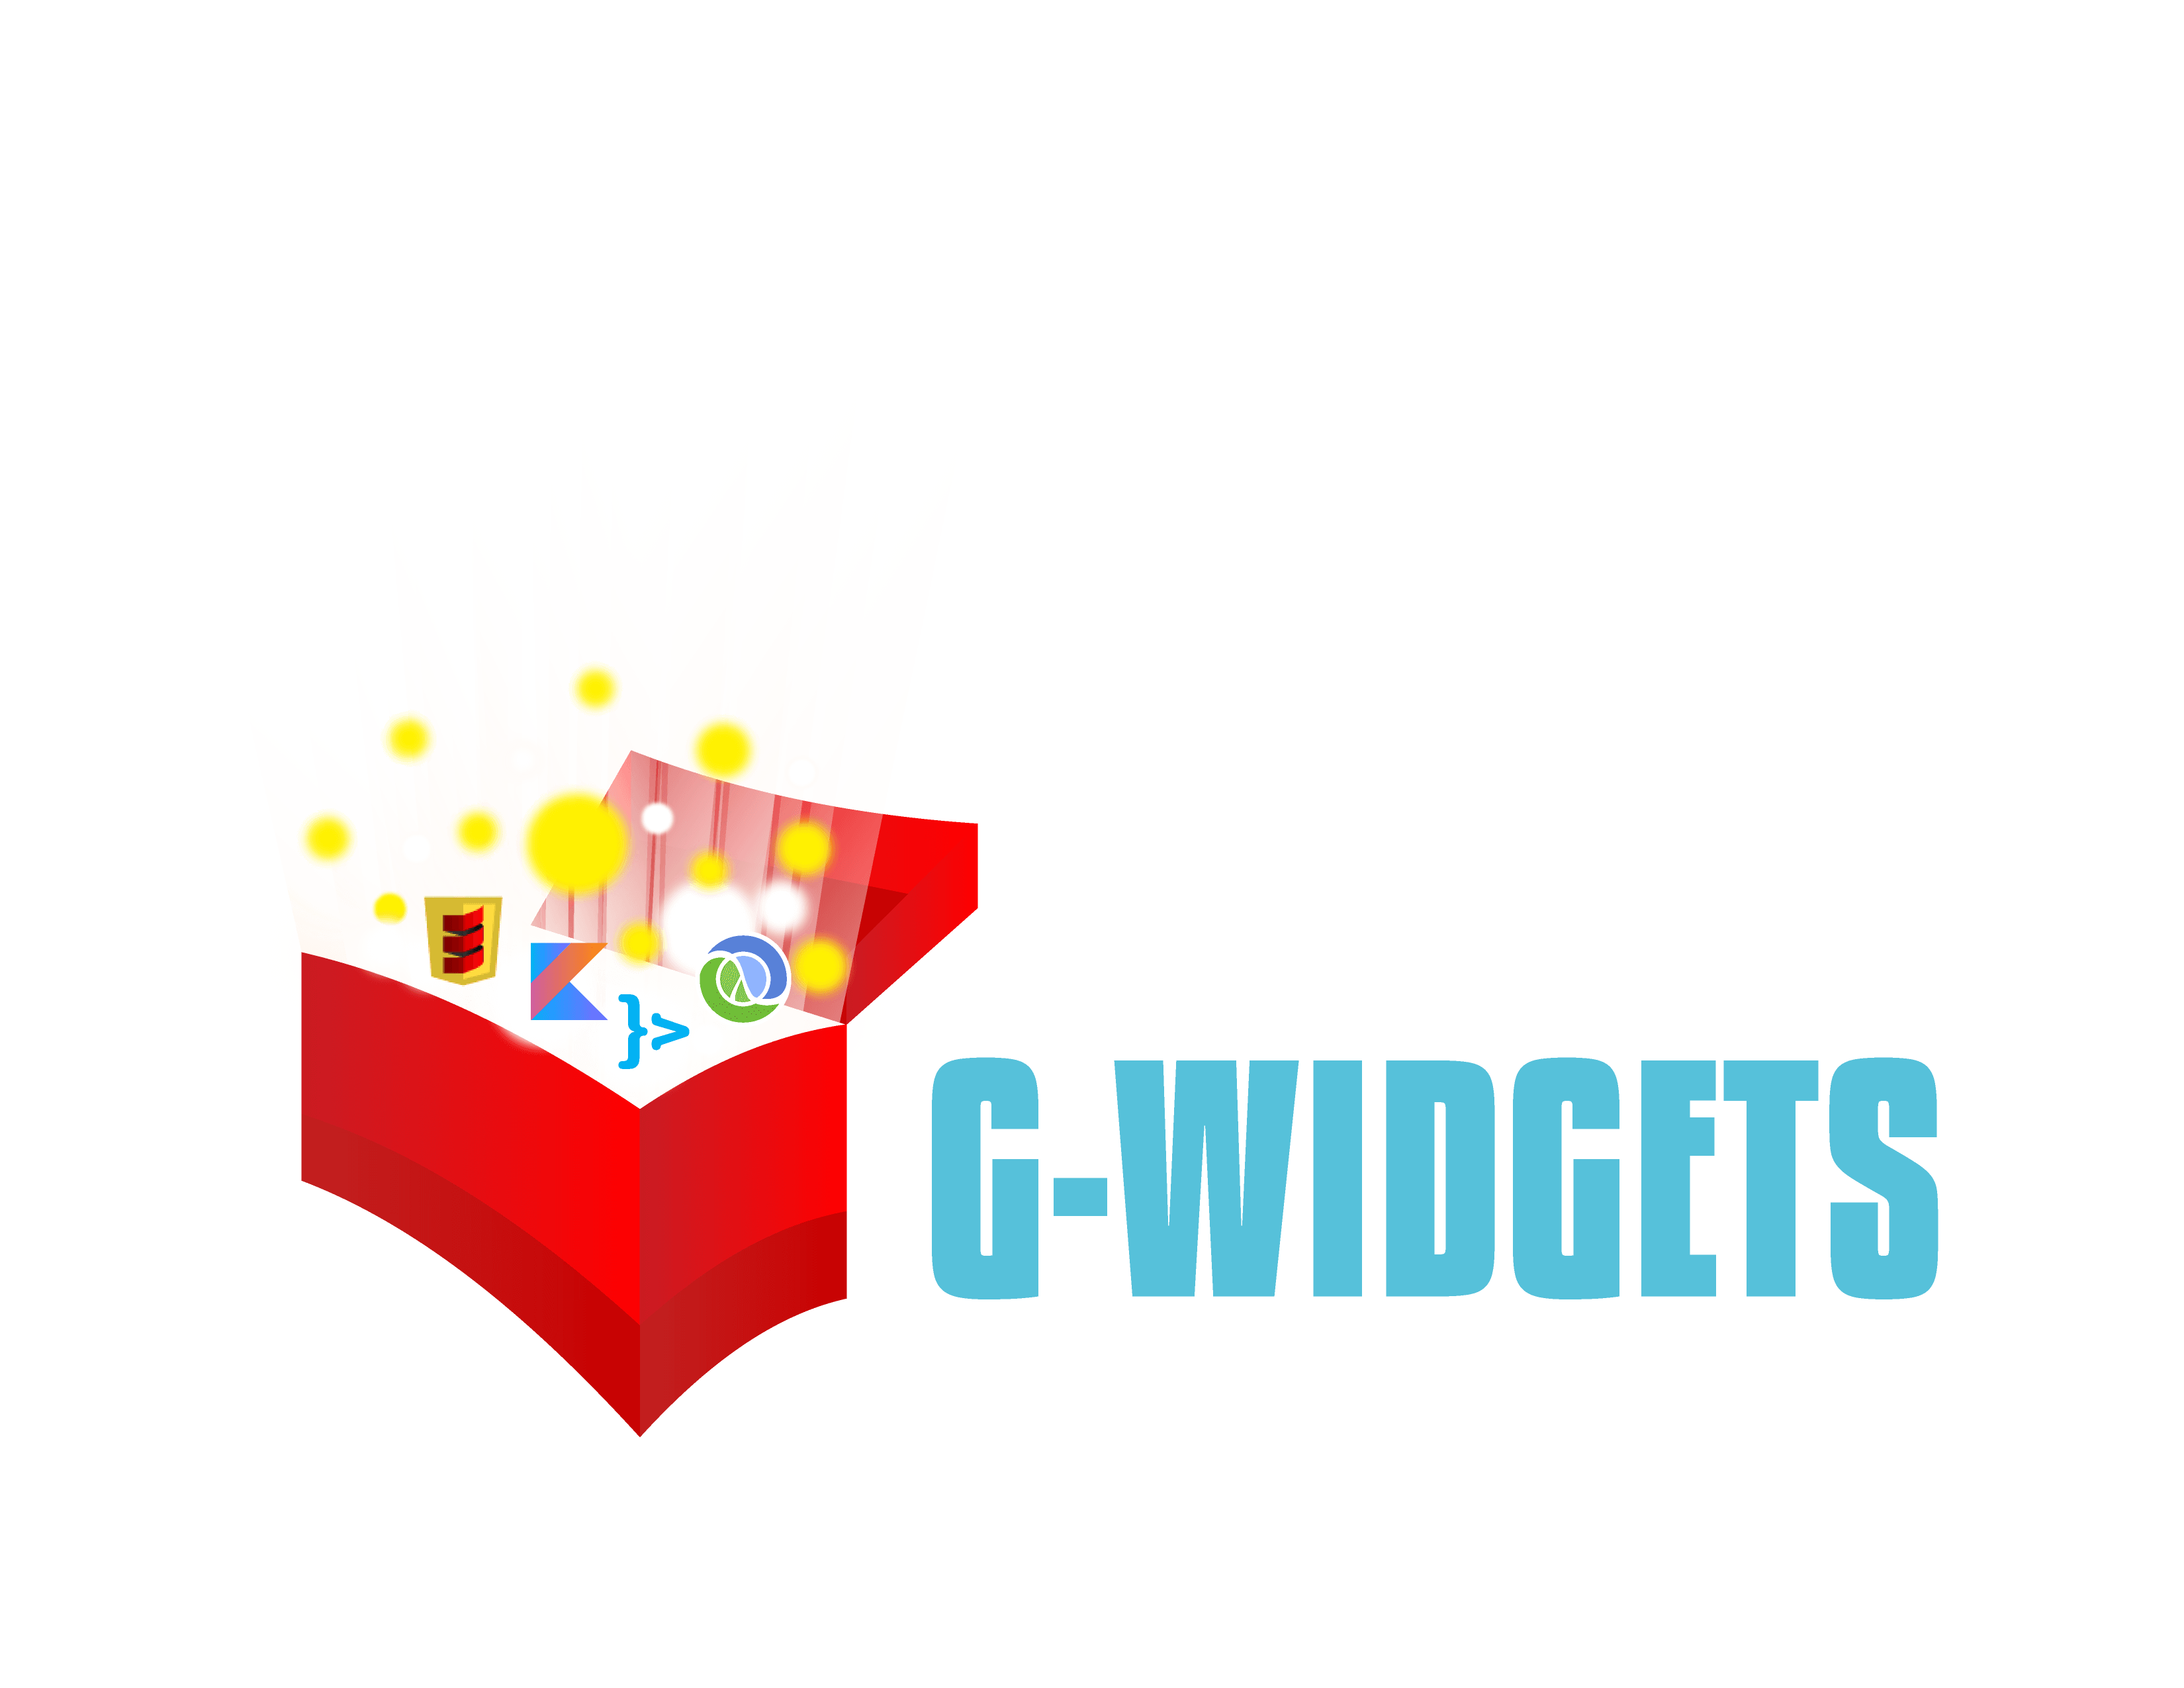 G-Widgets